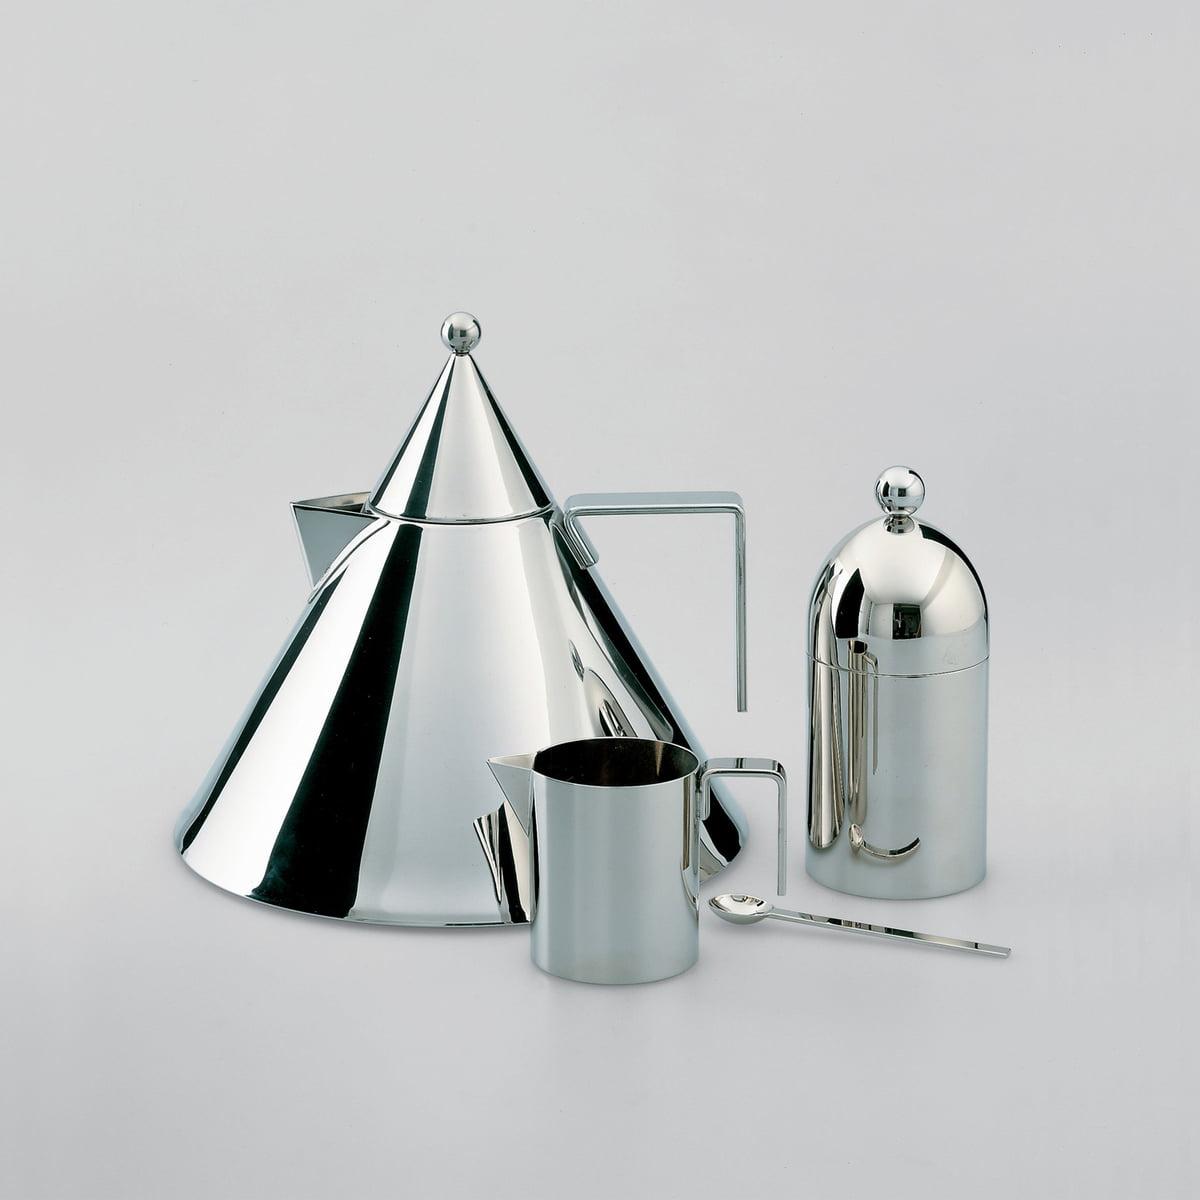 il conico wasserkessel von officina alessi. Black Bedroom Furniture Sets. Home Design Ideas